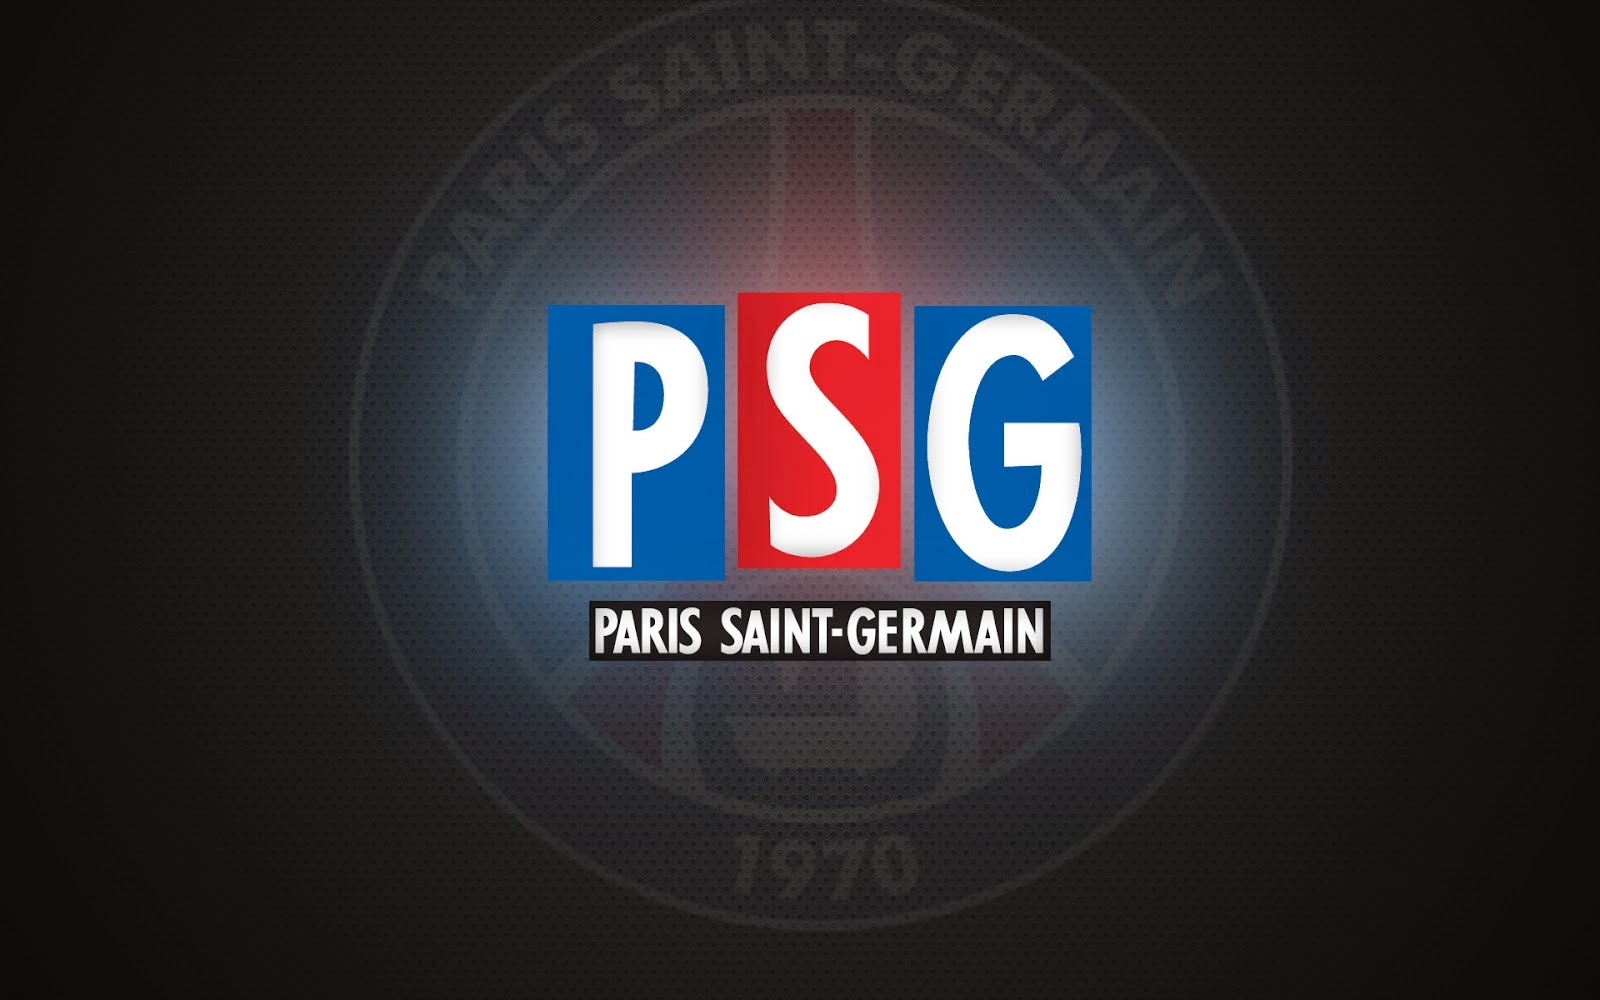 Hd Football Wallpapers Paris Saint Germain Wallpapers